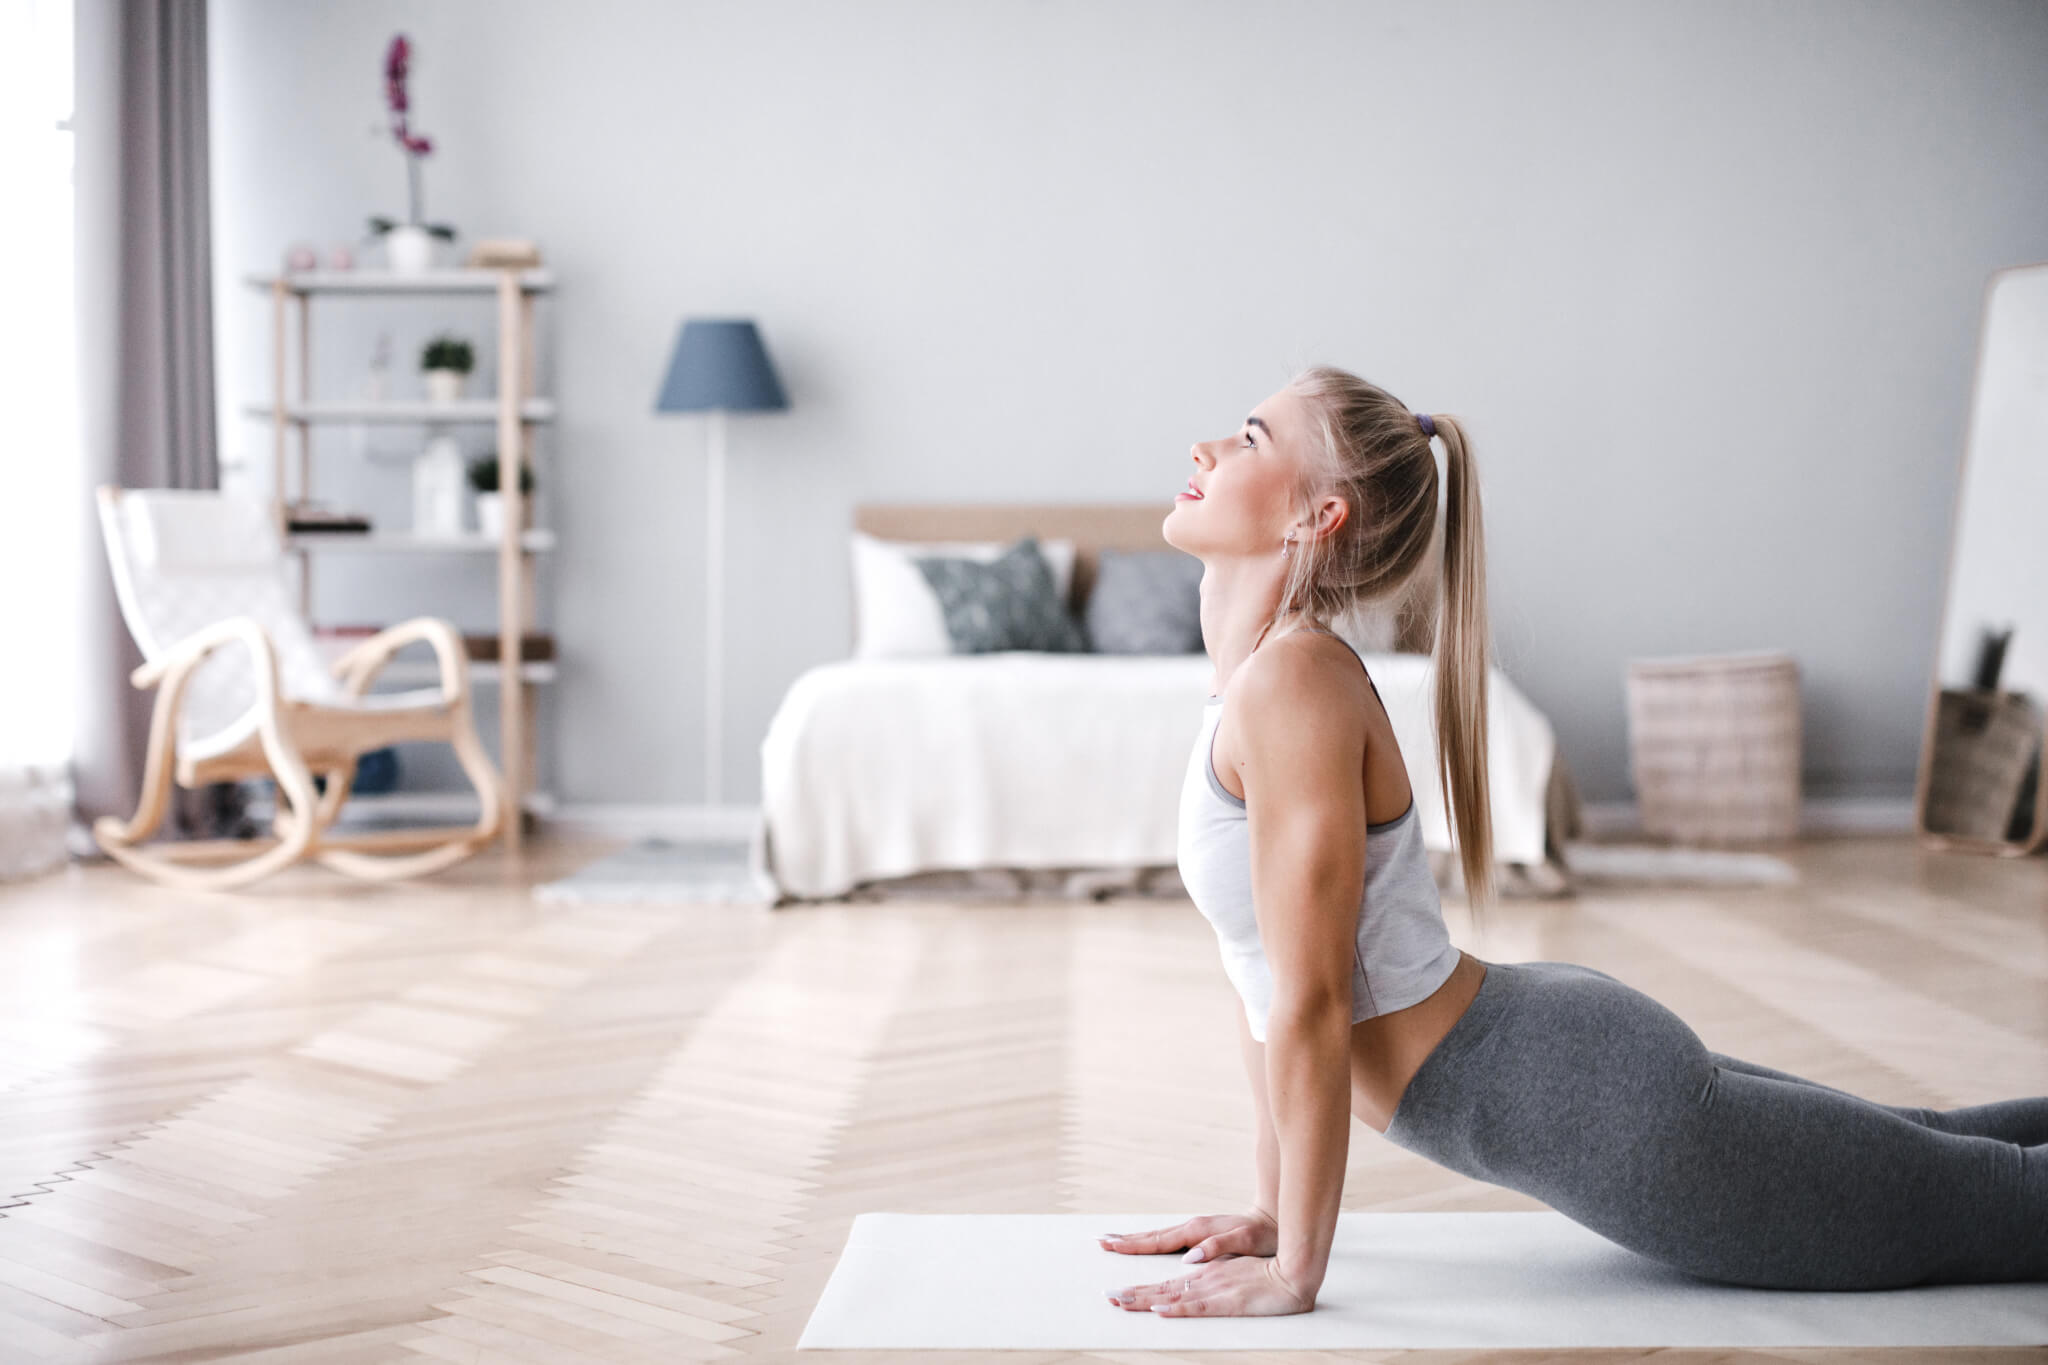 praktyka joga wdomu